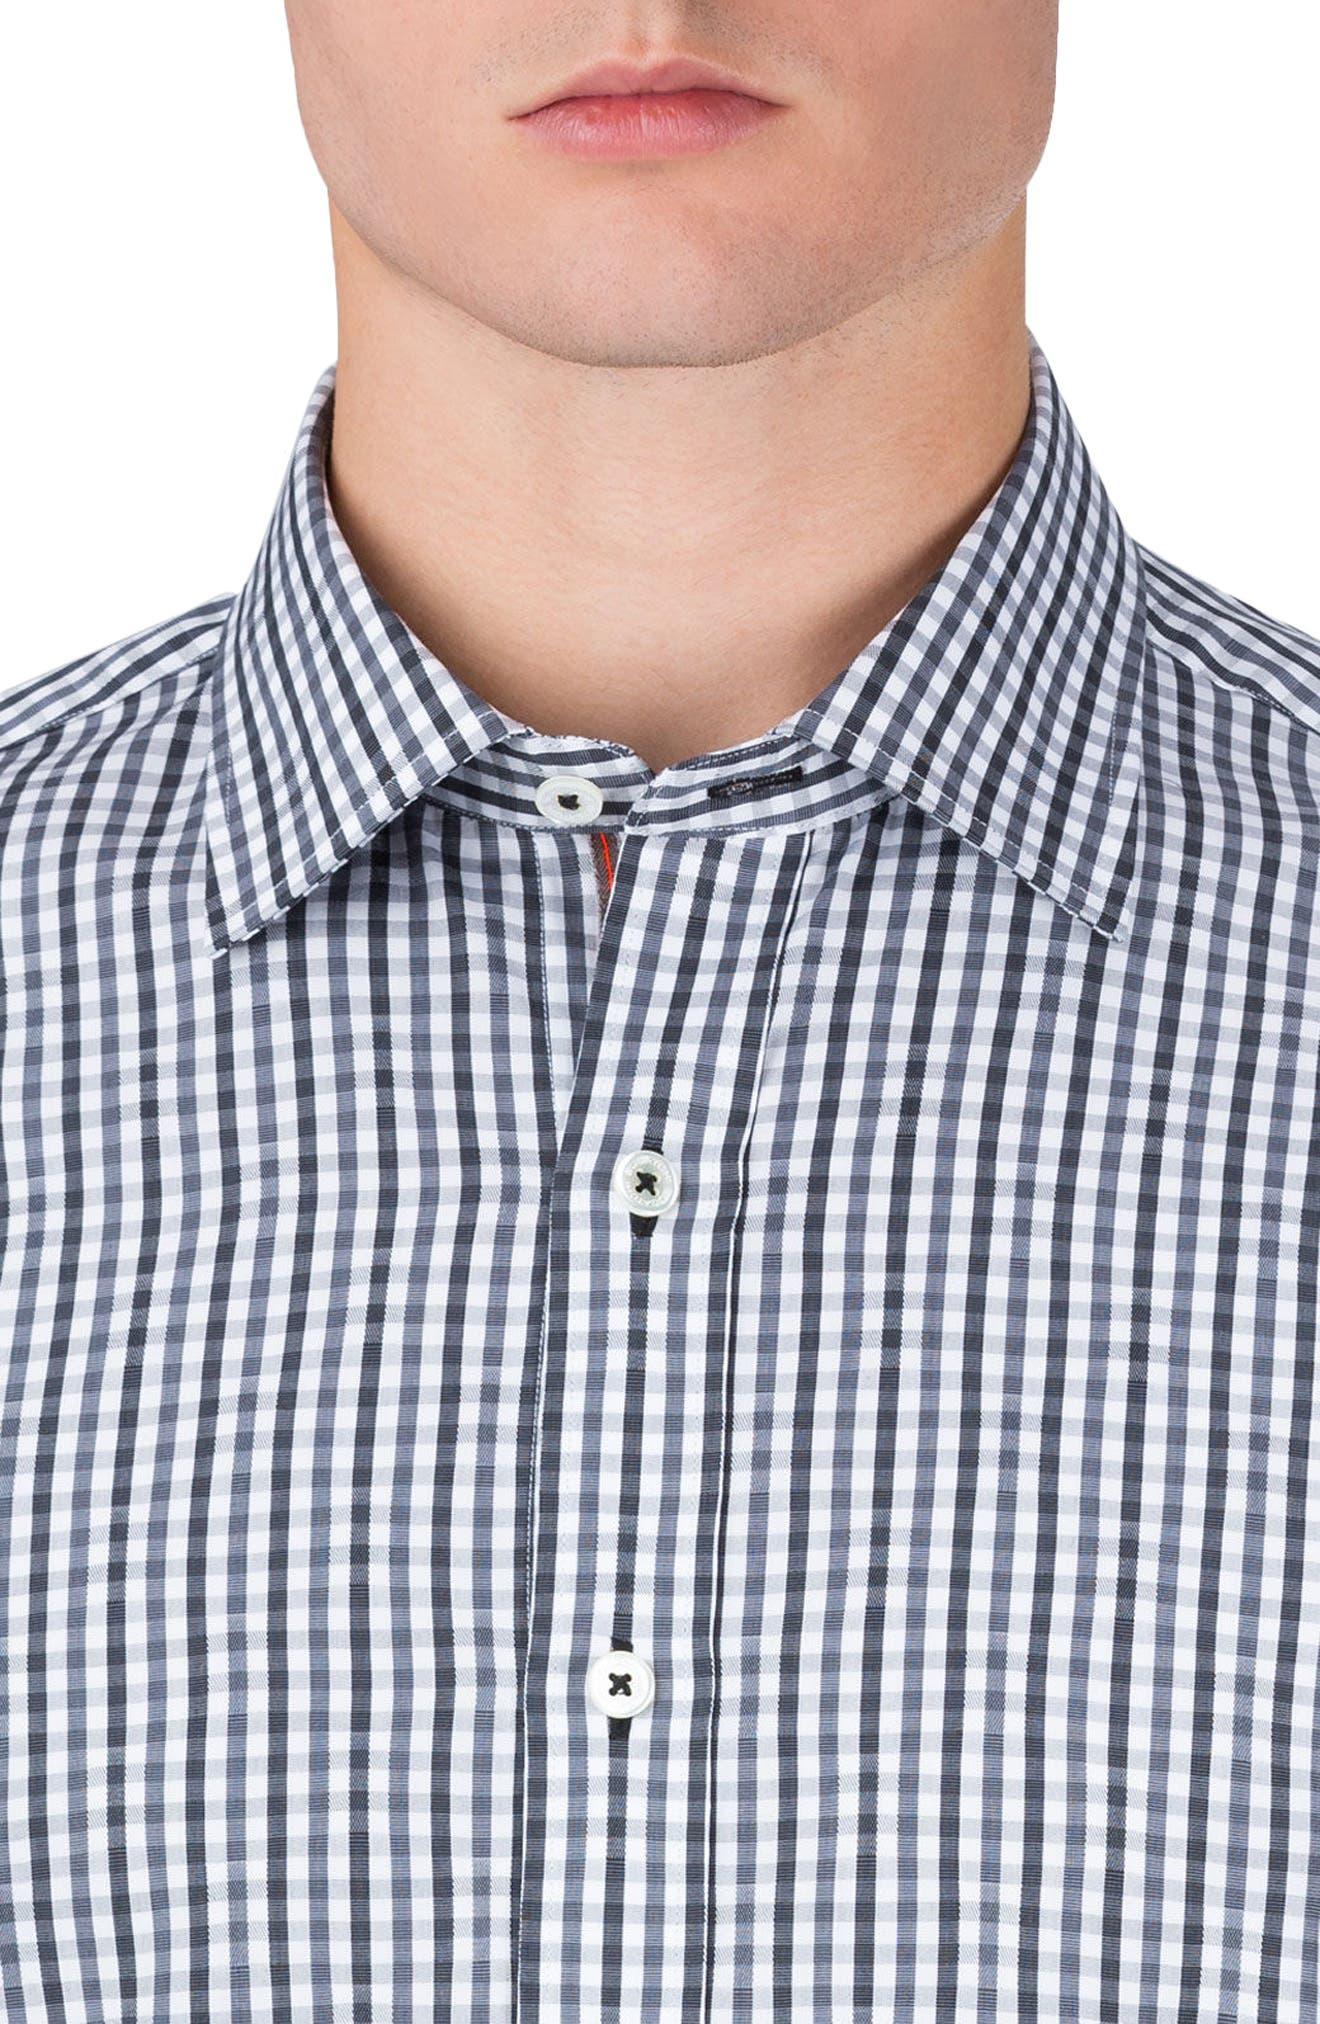 Classic Fit Gingham Sport Shirt,                             Alternate thumbnail 3, color,